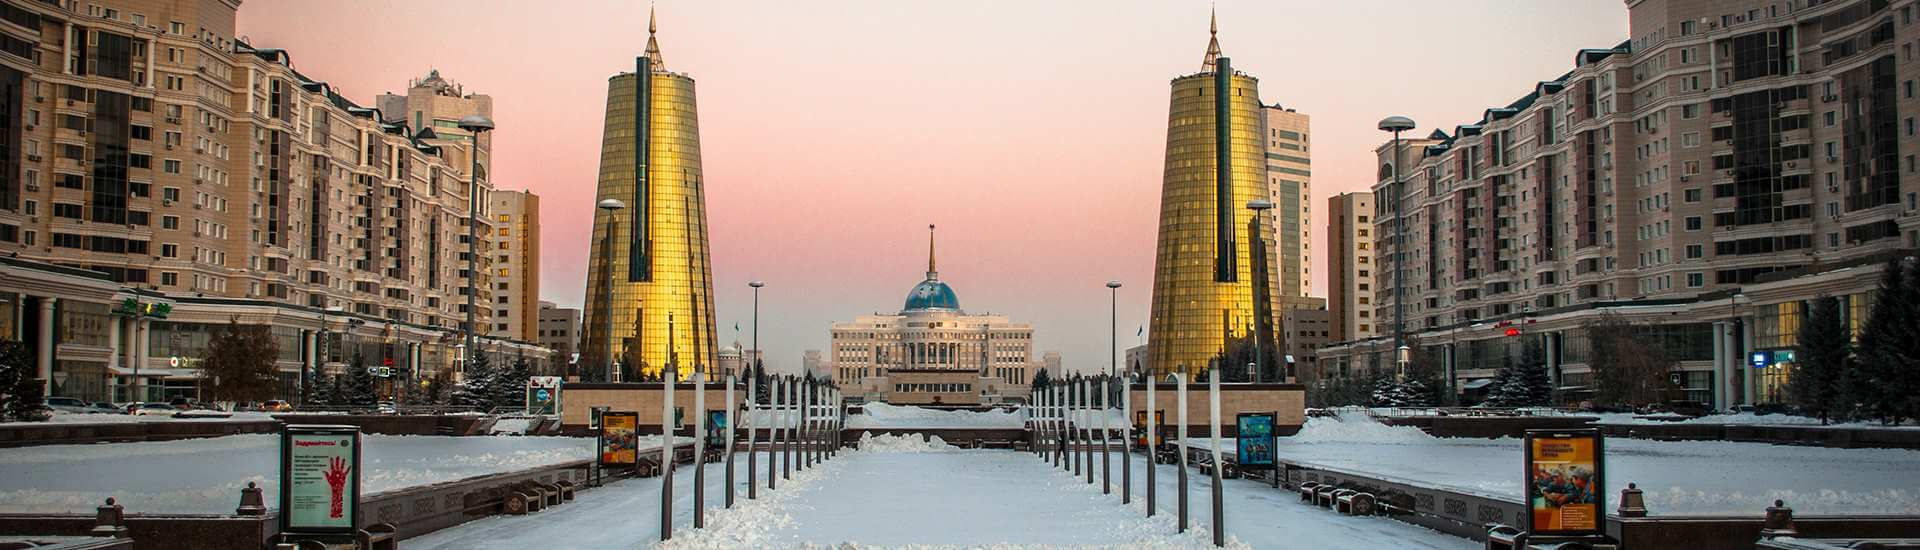 Astana Kazachstan